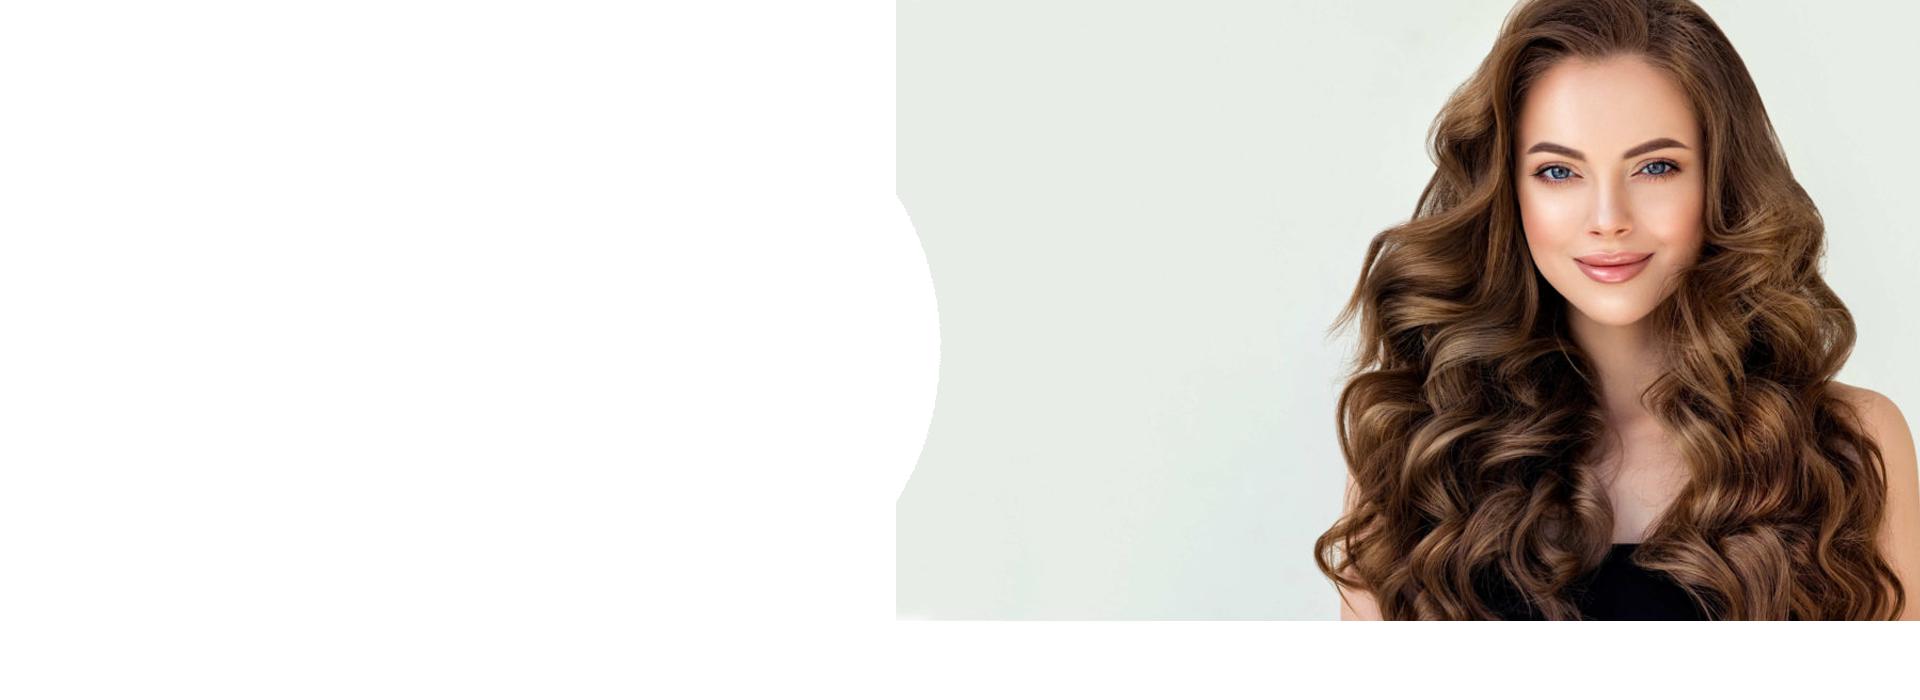 fondo-7